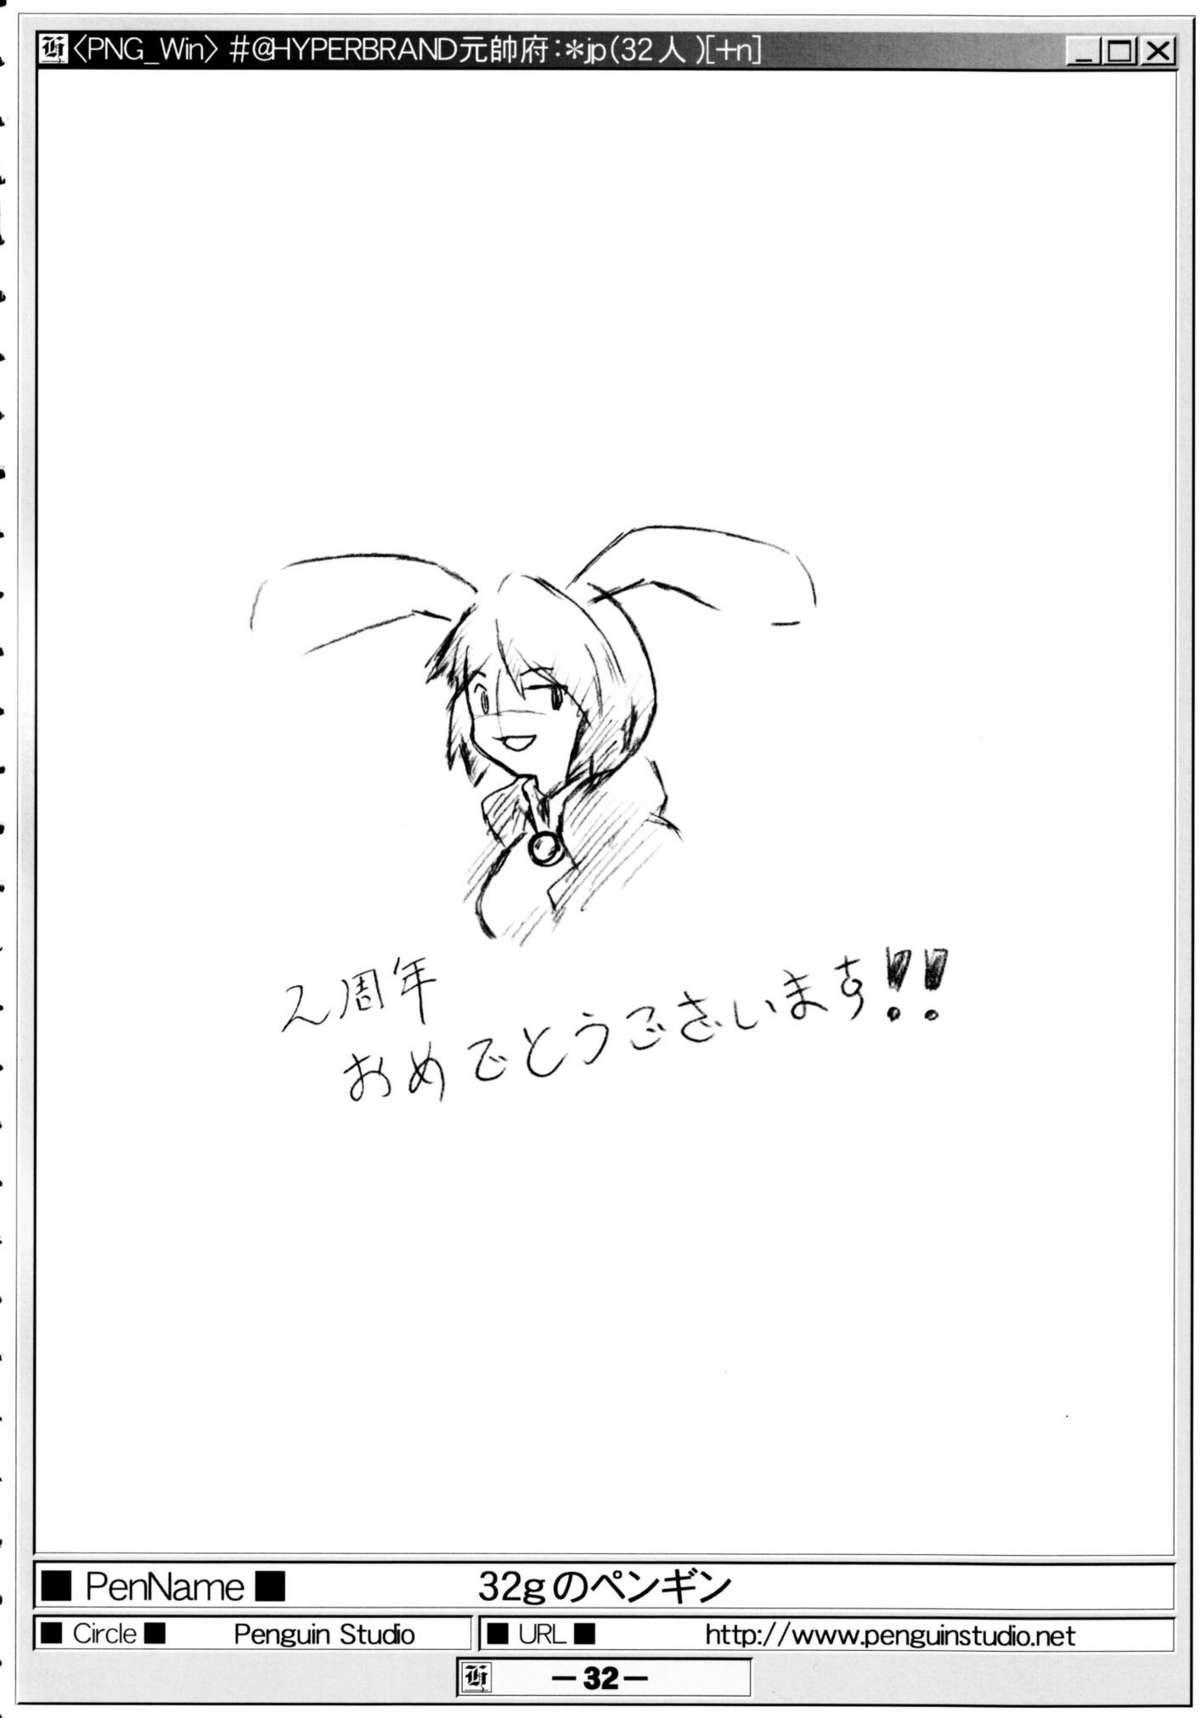 (Puniket 07) [HYPER BRAND (Deden, Ishihara Masumi, Kawamura Yasuhito)]  (Ragnarok Online) 30